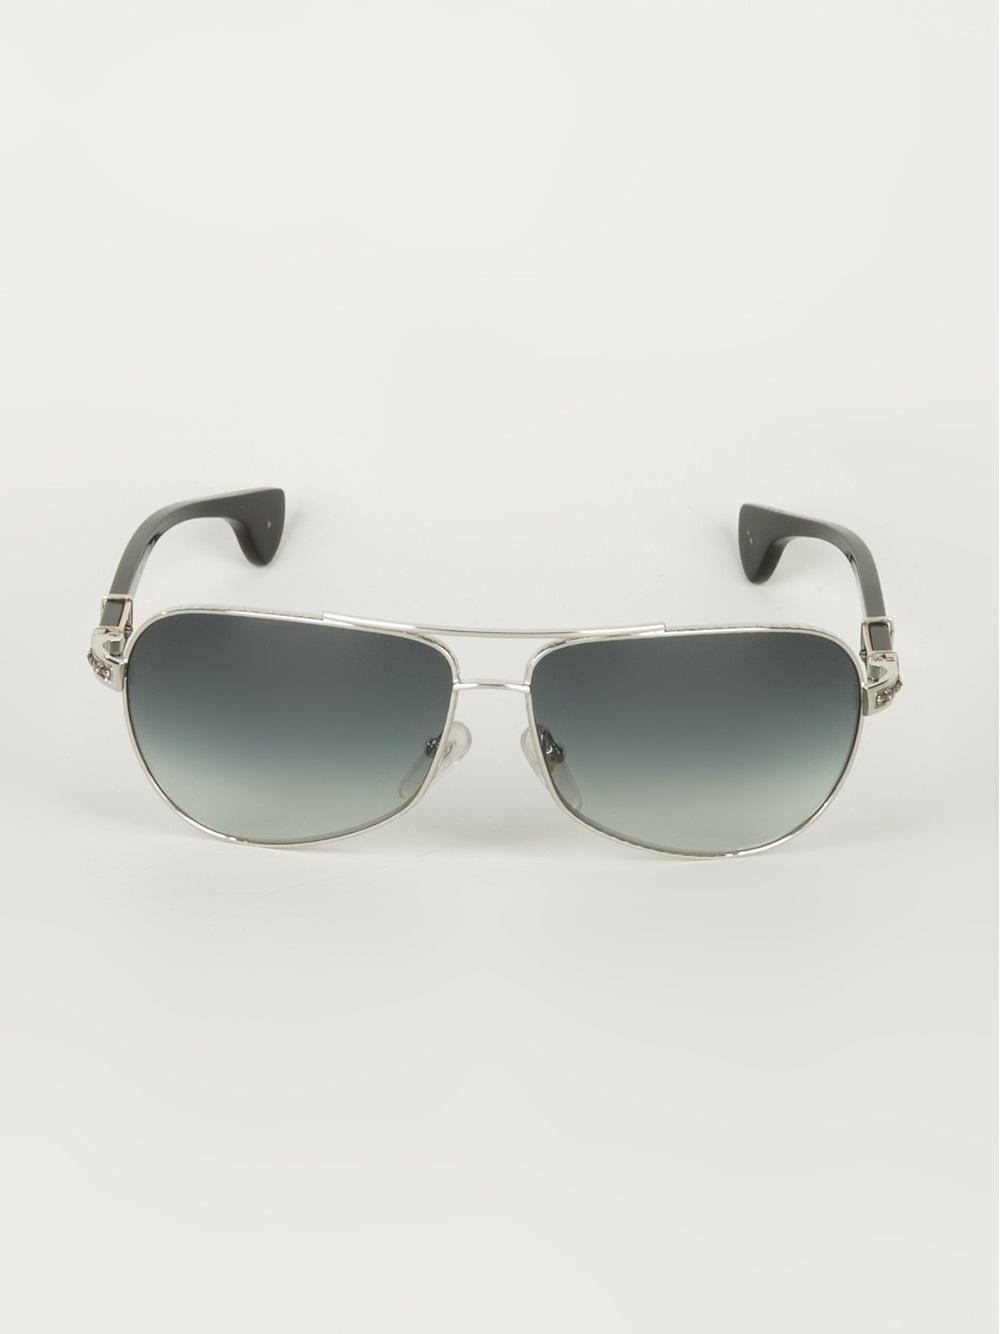 5d7d2a2be1e Lyst - Chrome Hearts Grand Beast Sunglasses in Black for Men